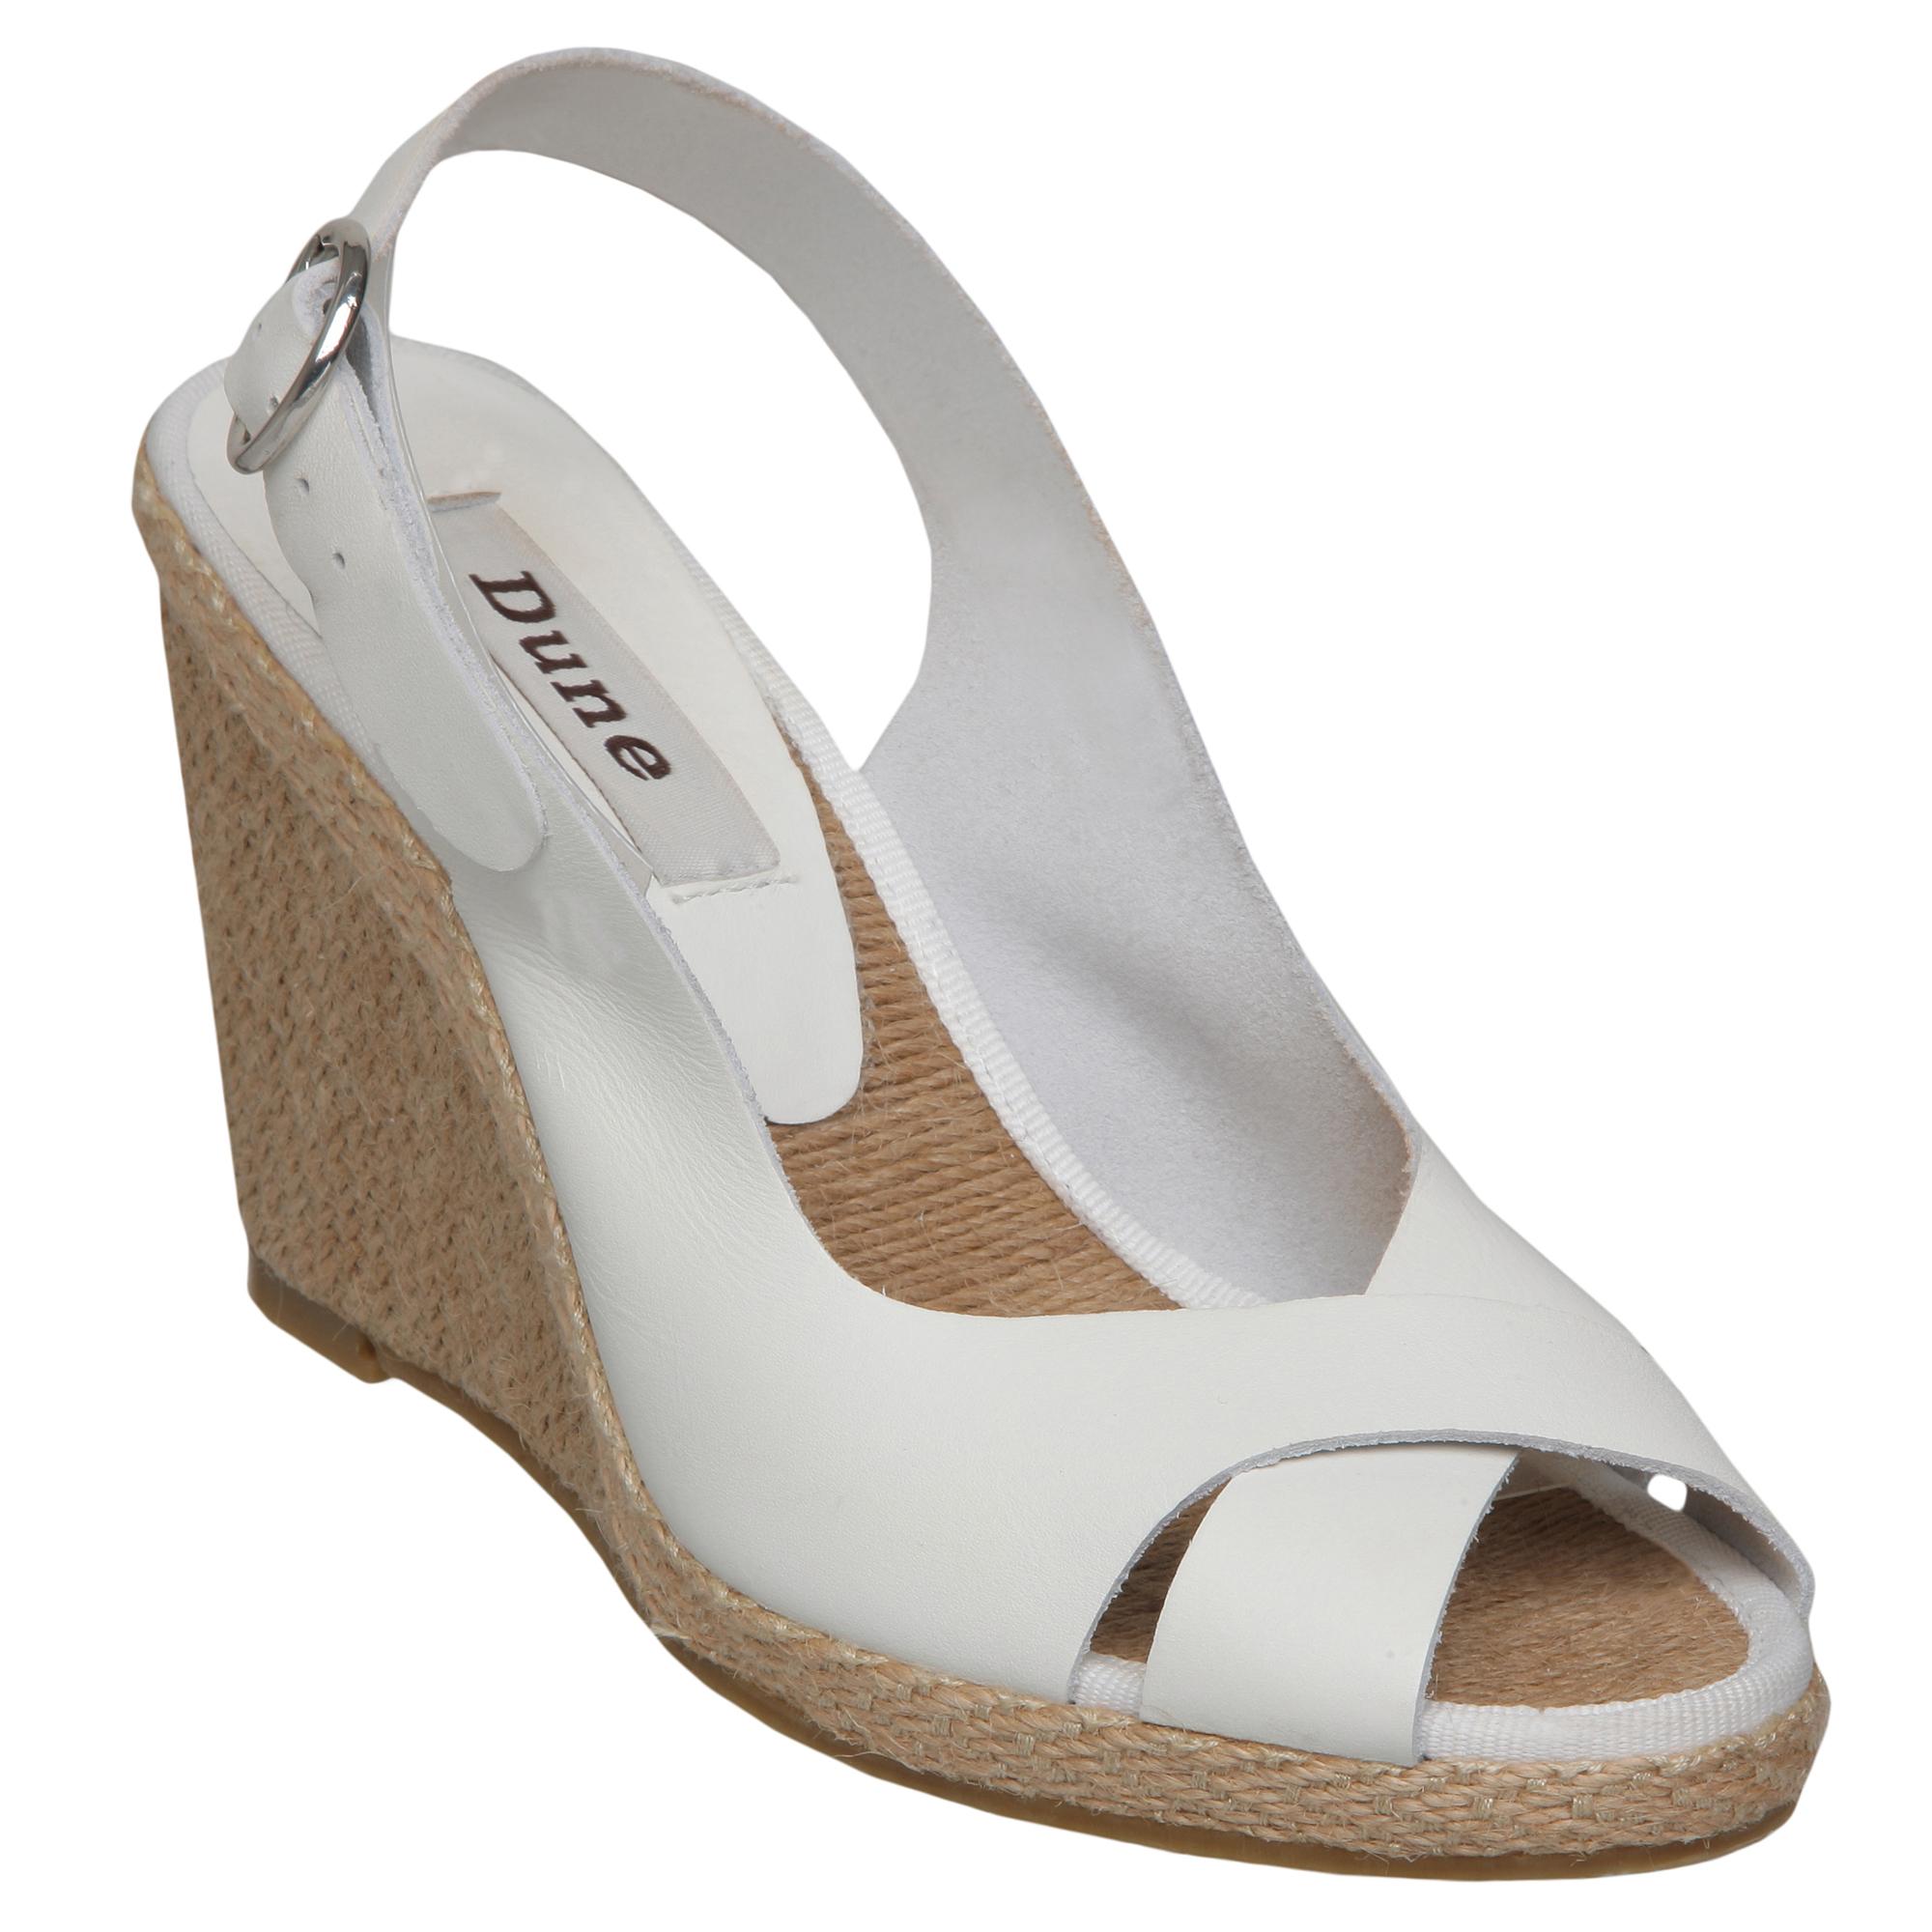 De Talla Acerca Mujer Gong Mostrar Para Cuña Detalles Zapatos Alpargata 8 Título Blanco Sandalia Damas 3 Original Nuevas Cuero Duna NwkXO8n0P